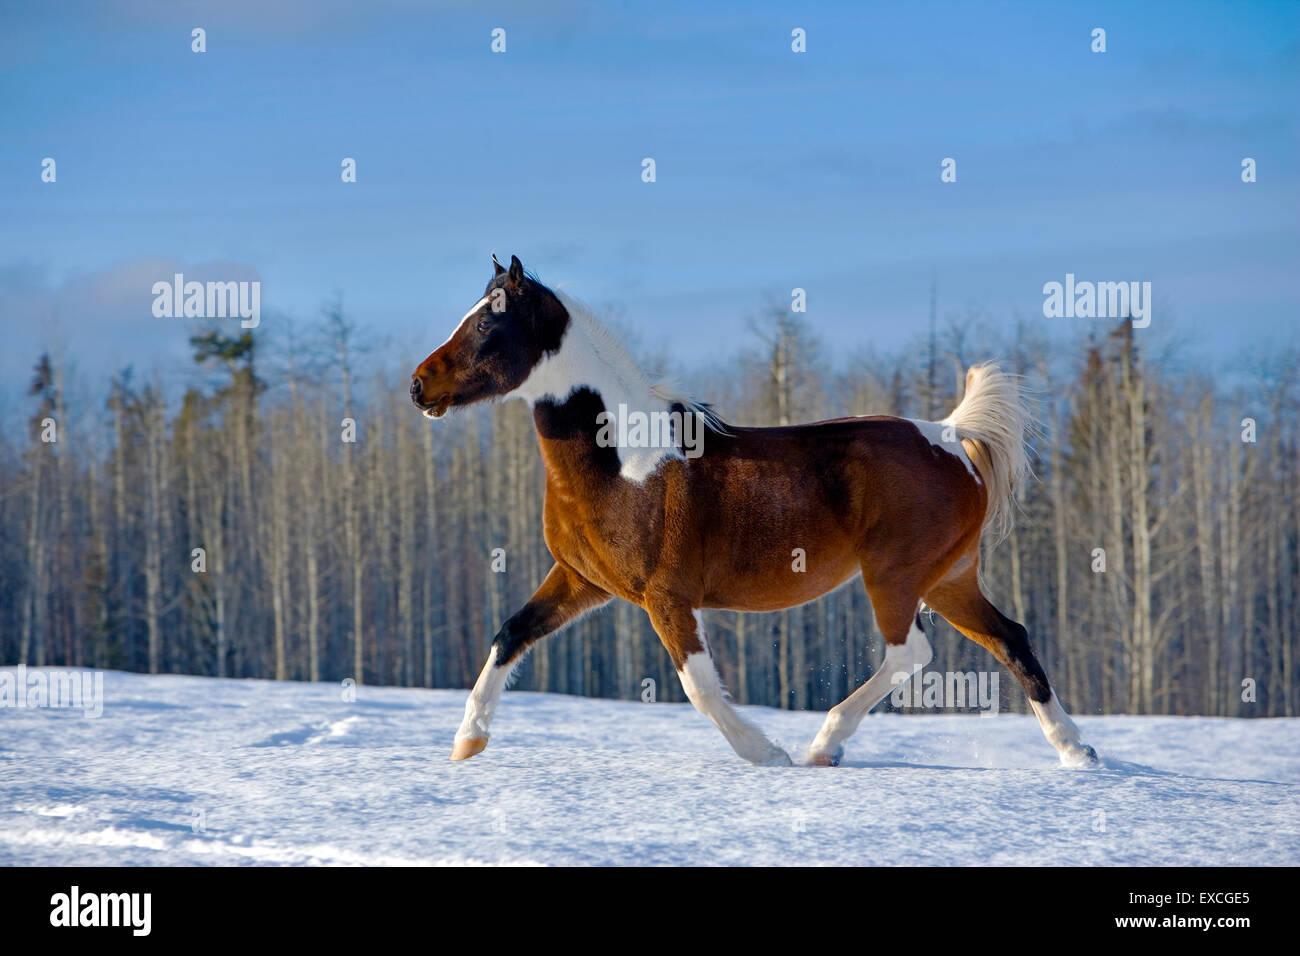 Arab Paint Gelding trotting on snow, portrait profile - Stock Image